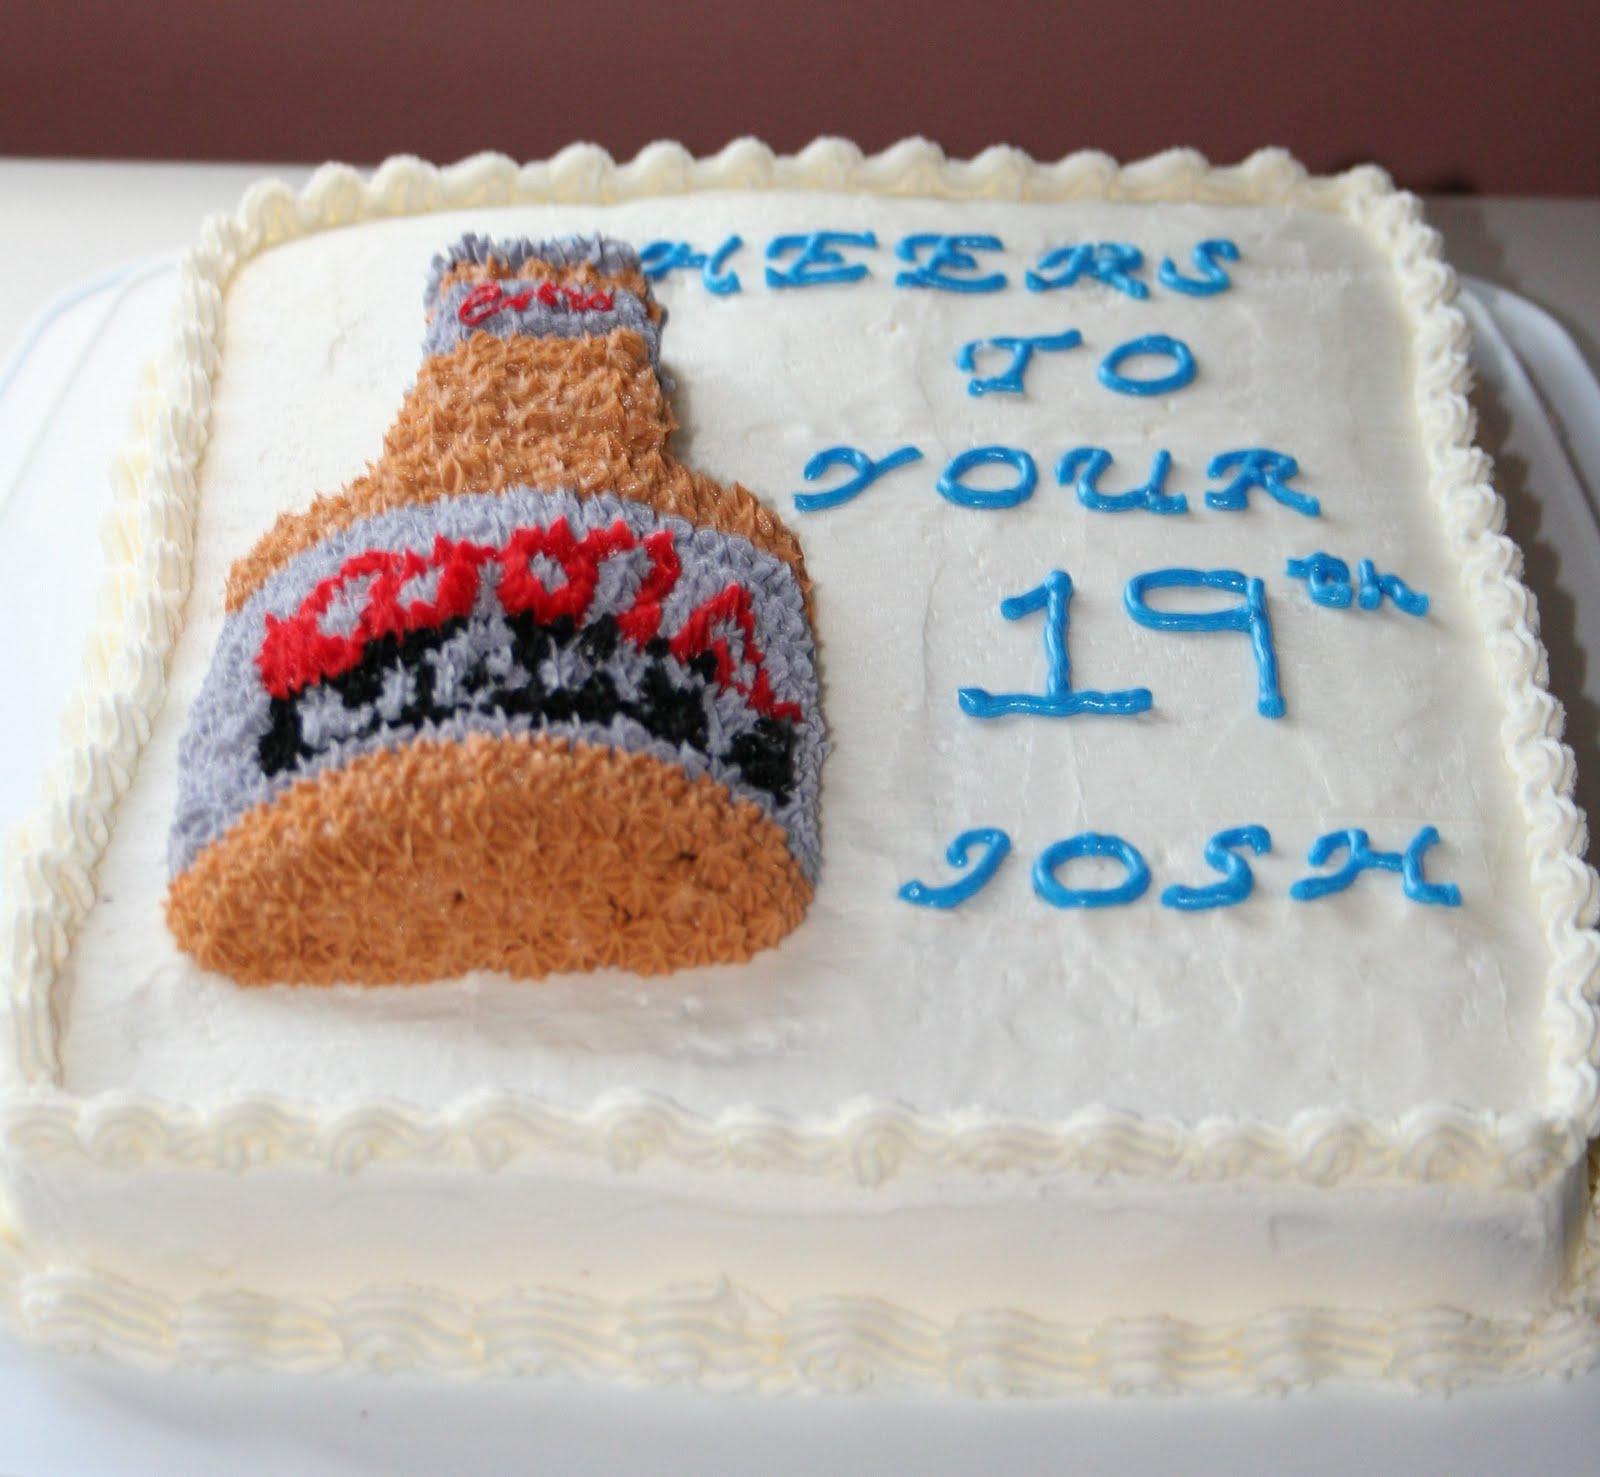 I Love Cake August 2010